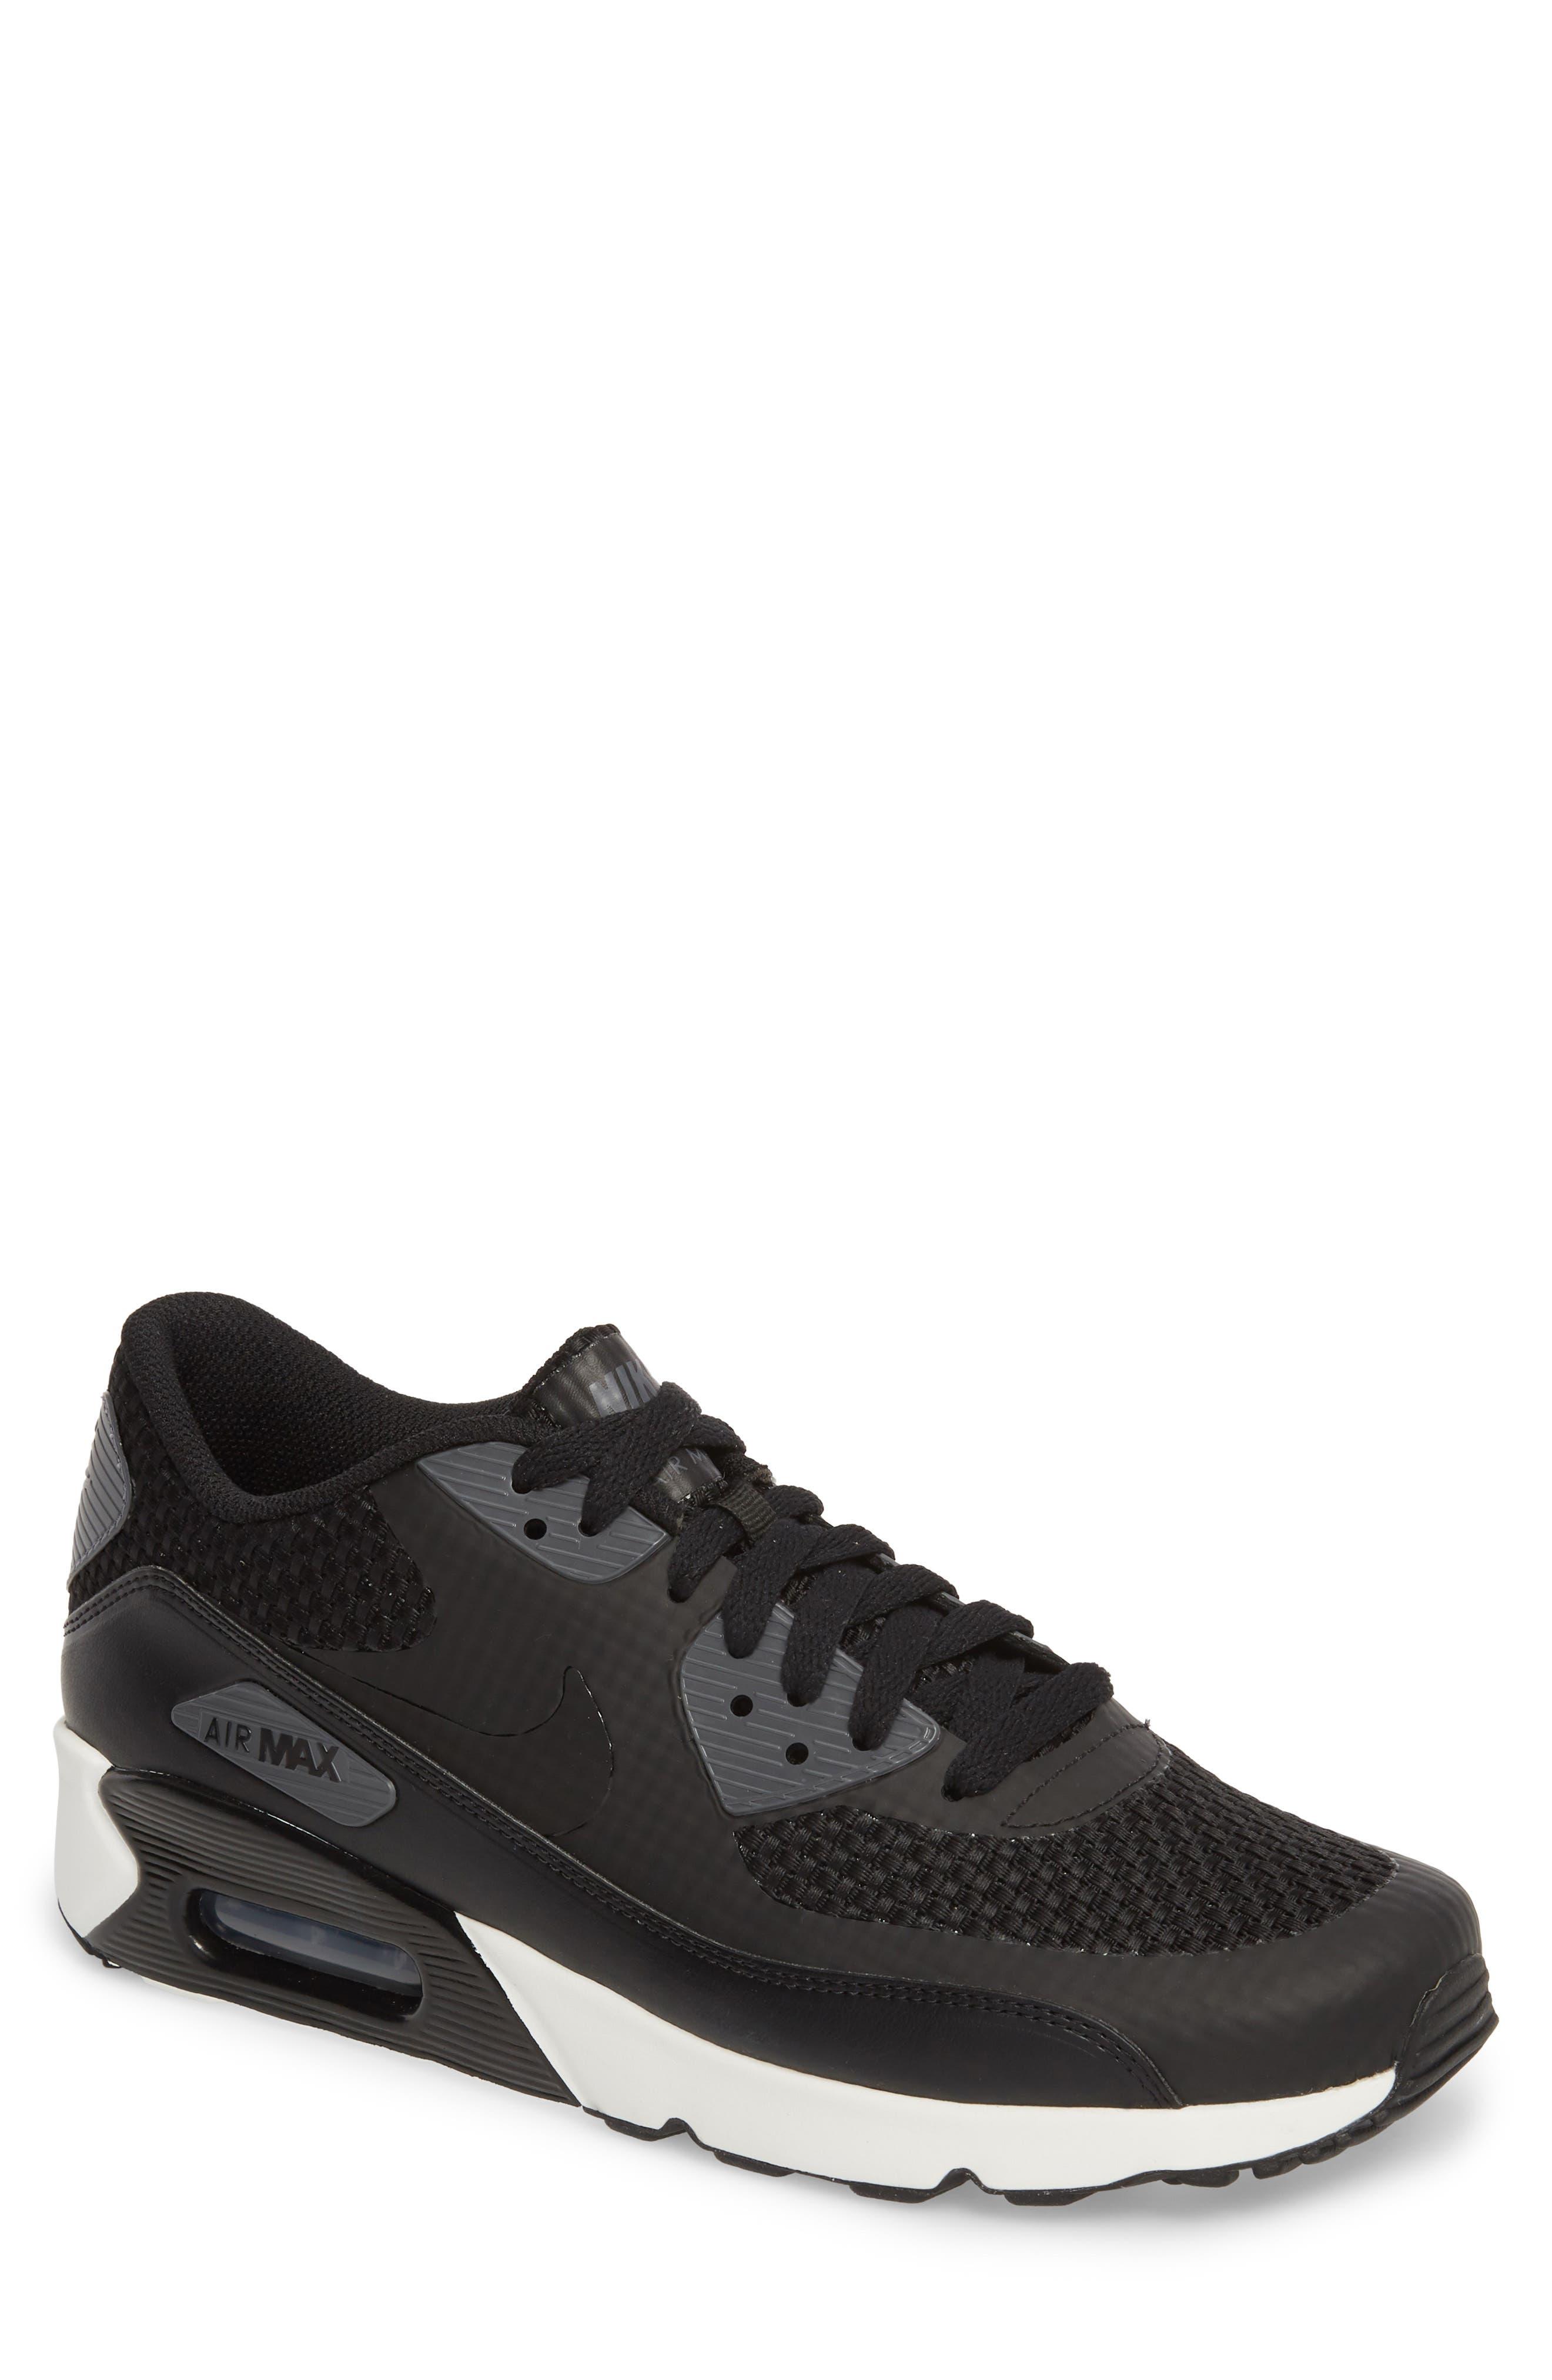 Air Max 90 Ultra 2.0 SE Sneaker,                             Main thumbnail 1, color,